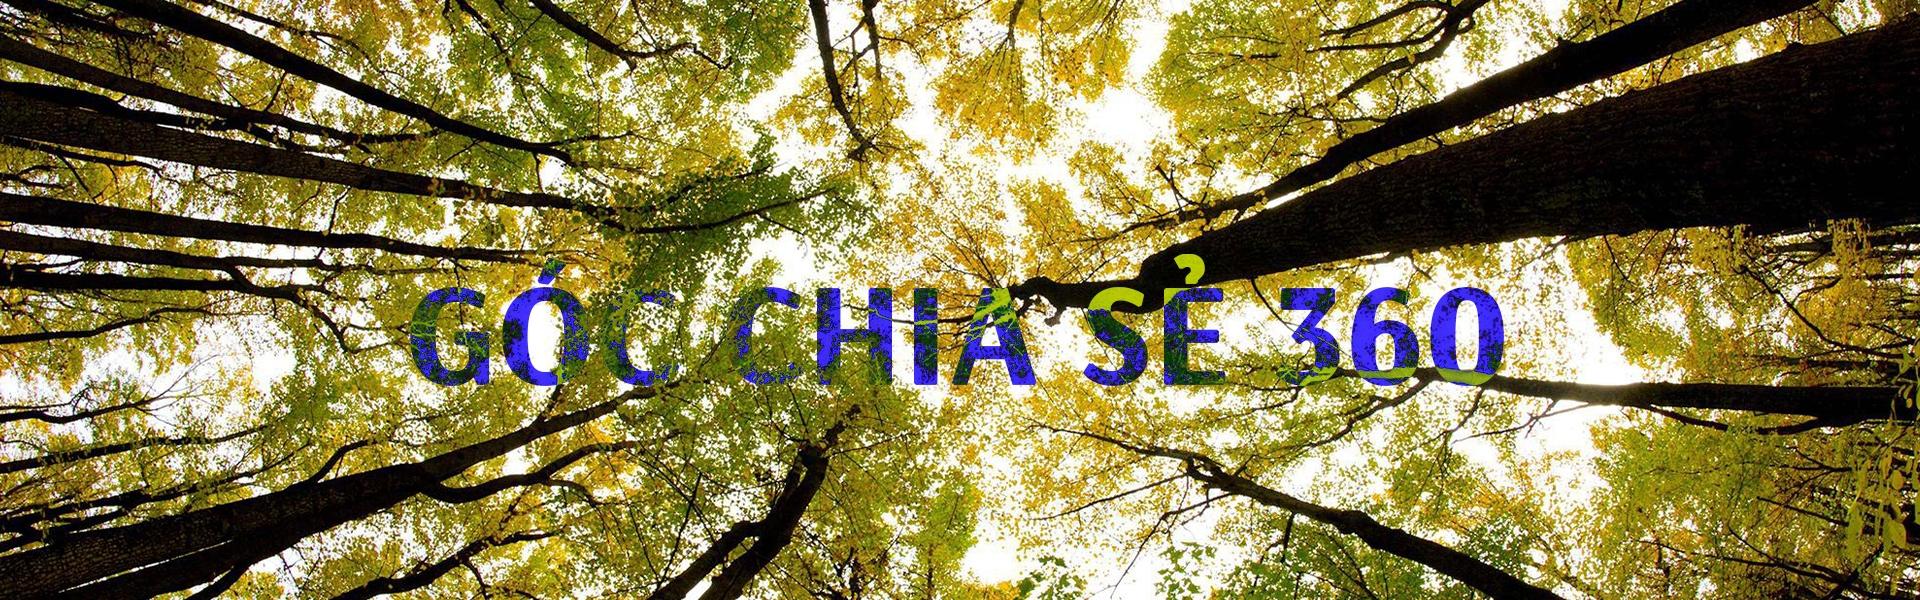 Góc Chia Sẻ 360 (@gocchiase360) Cover Image